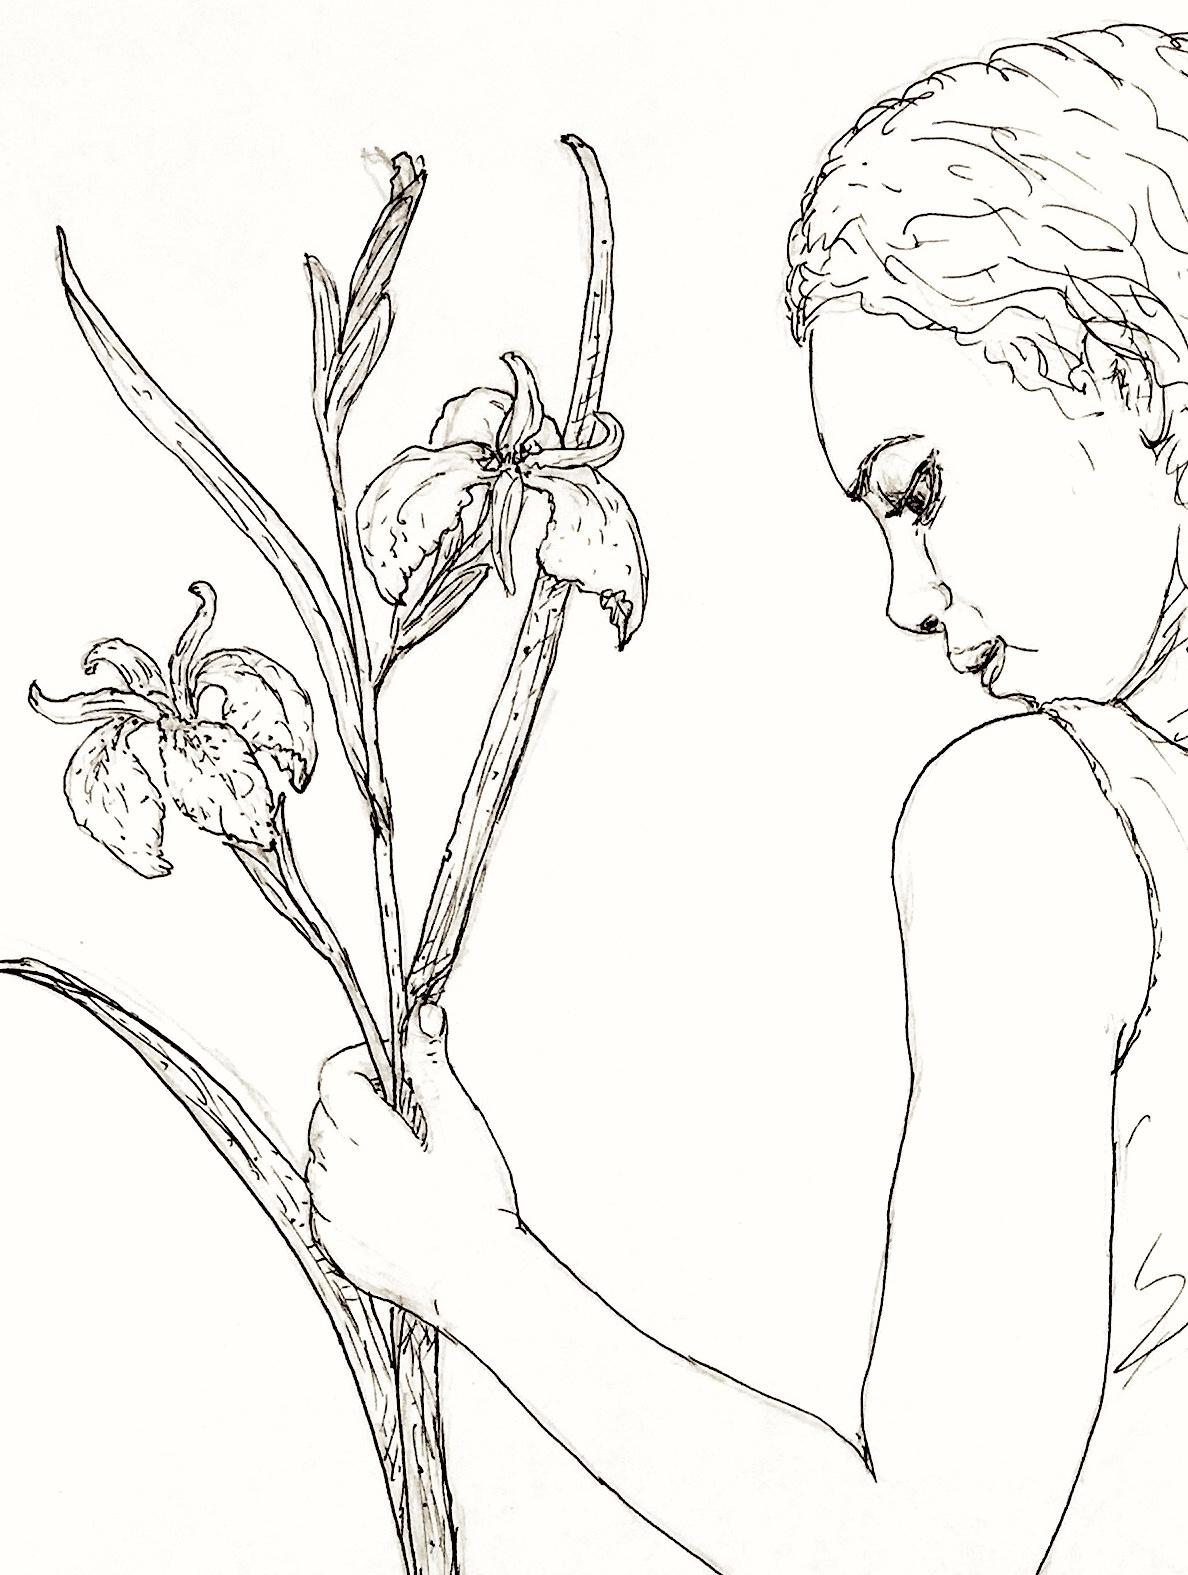 Iris-Hiam-CroppedCloseup